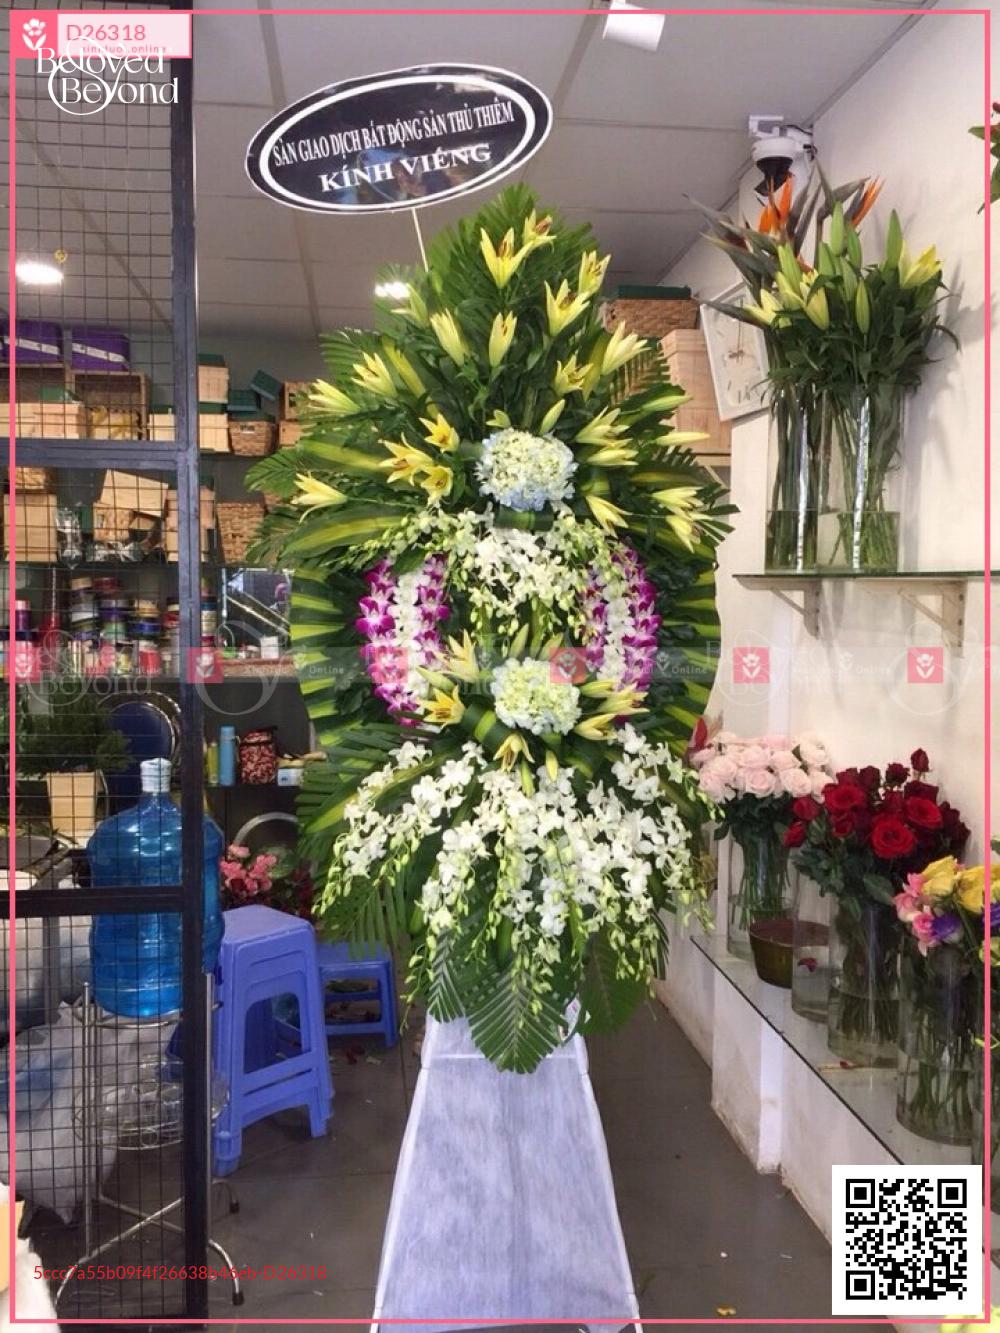 Hoa chia buồn - D26318 - xinhtuoi.online